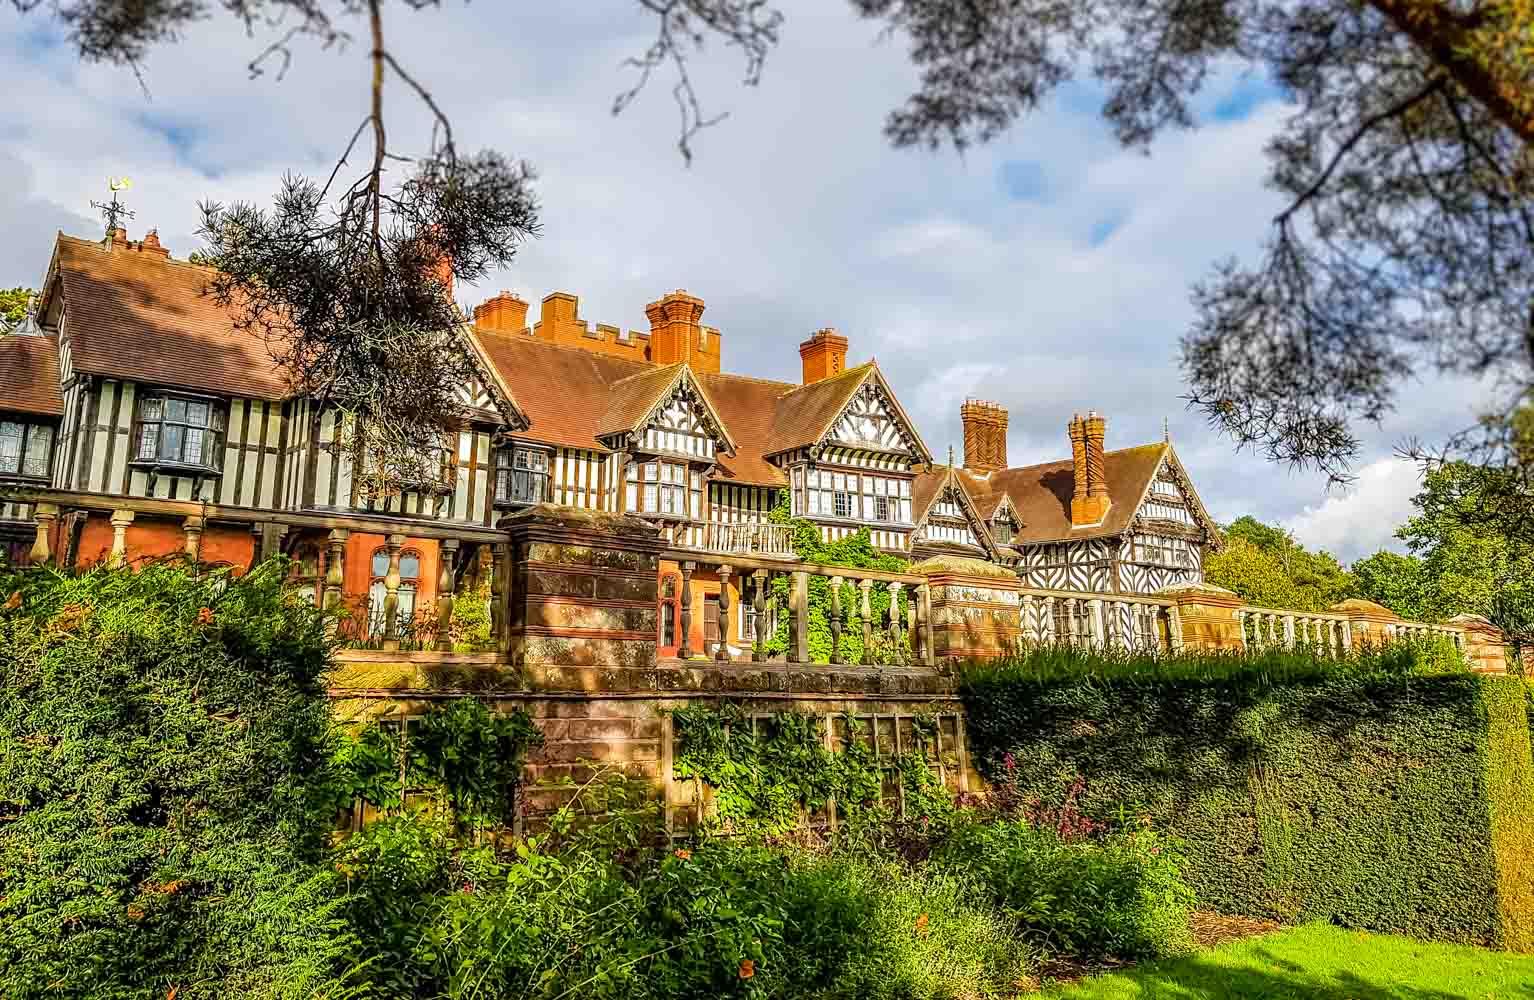 A Walk Around Wightwick Manor and Gardens 1